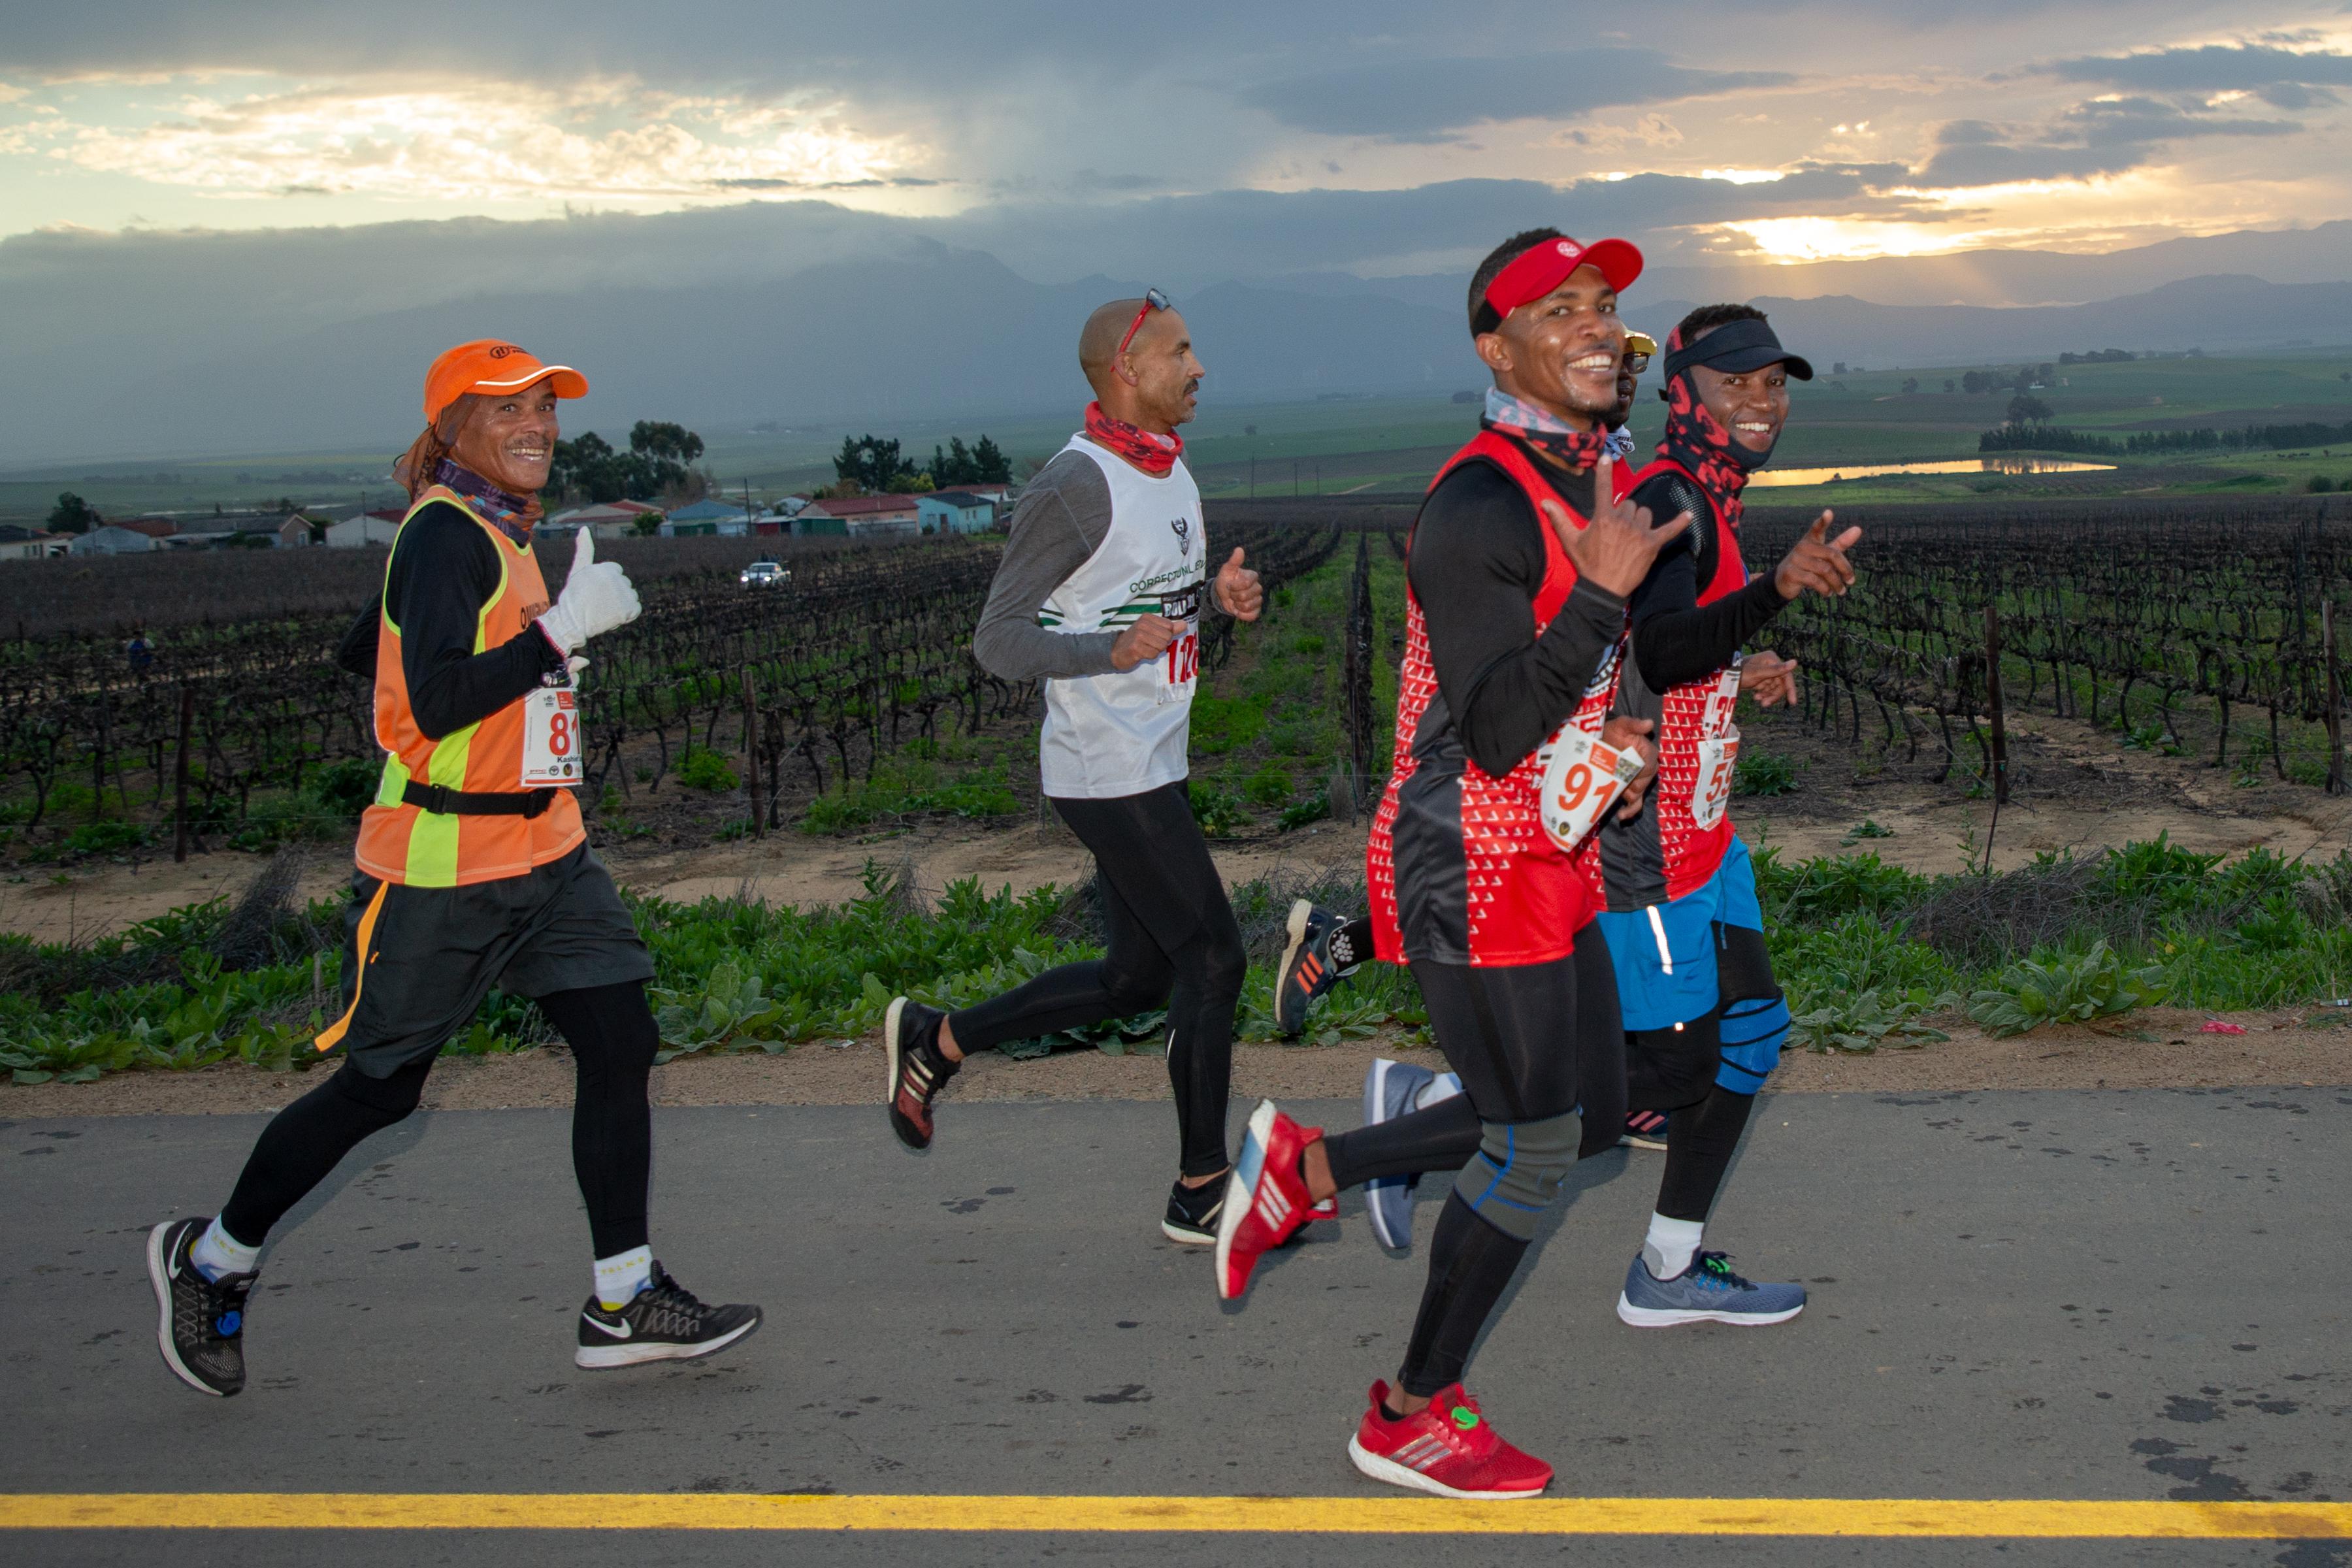 34th PPC Riebeek Bergmarathon